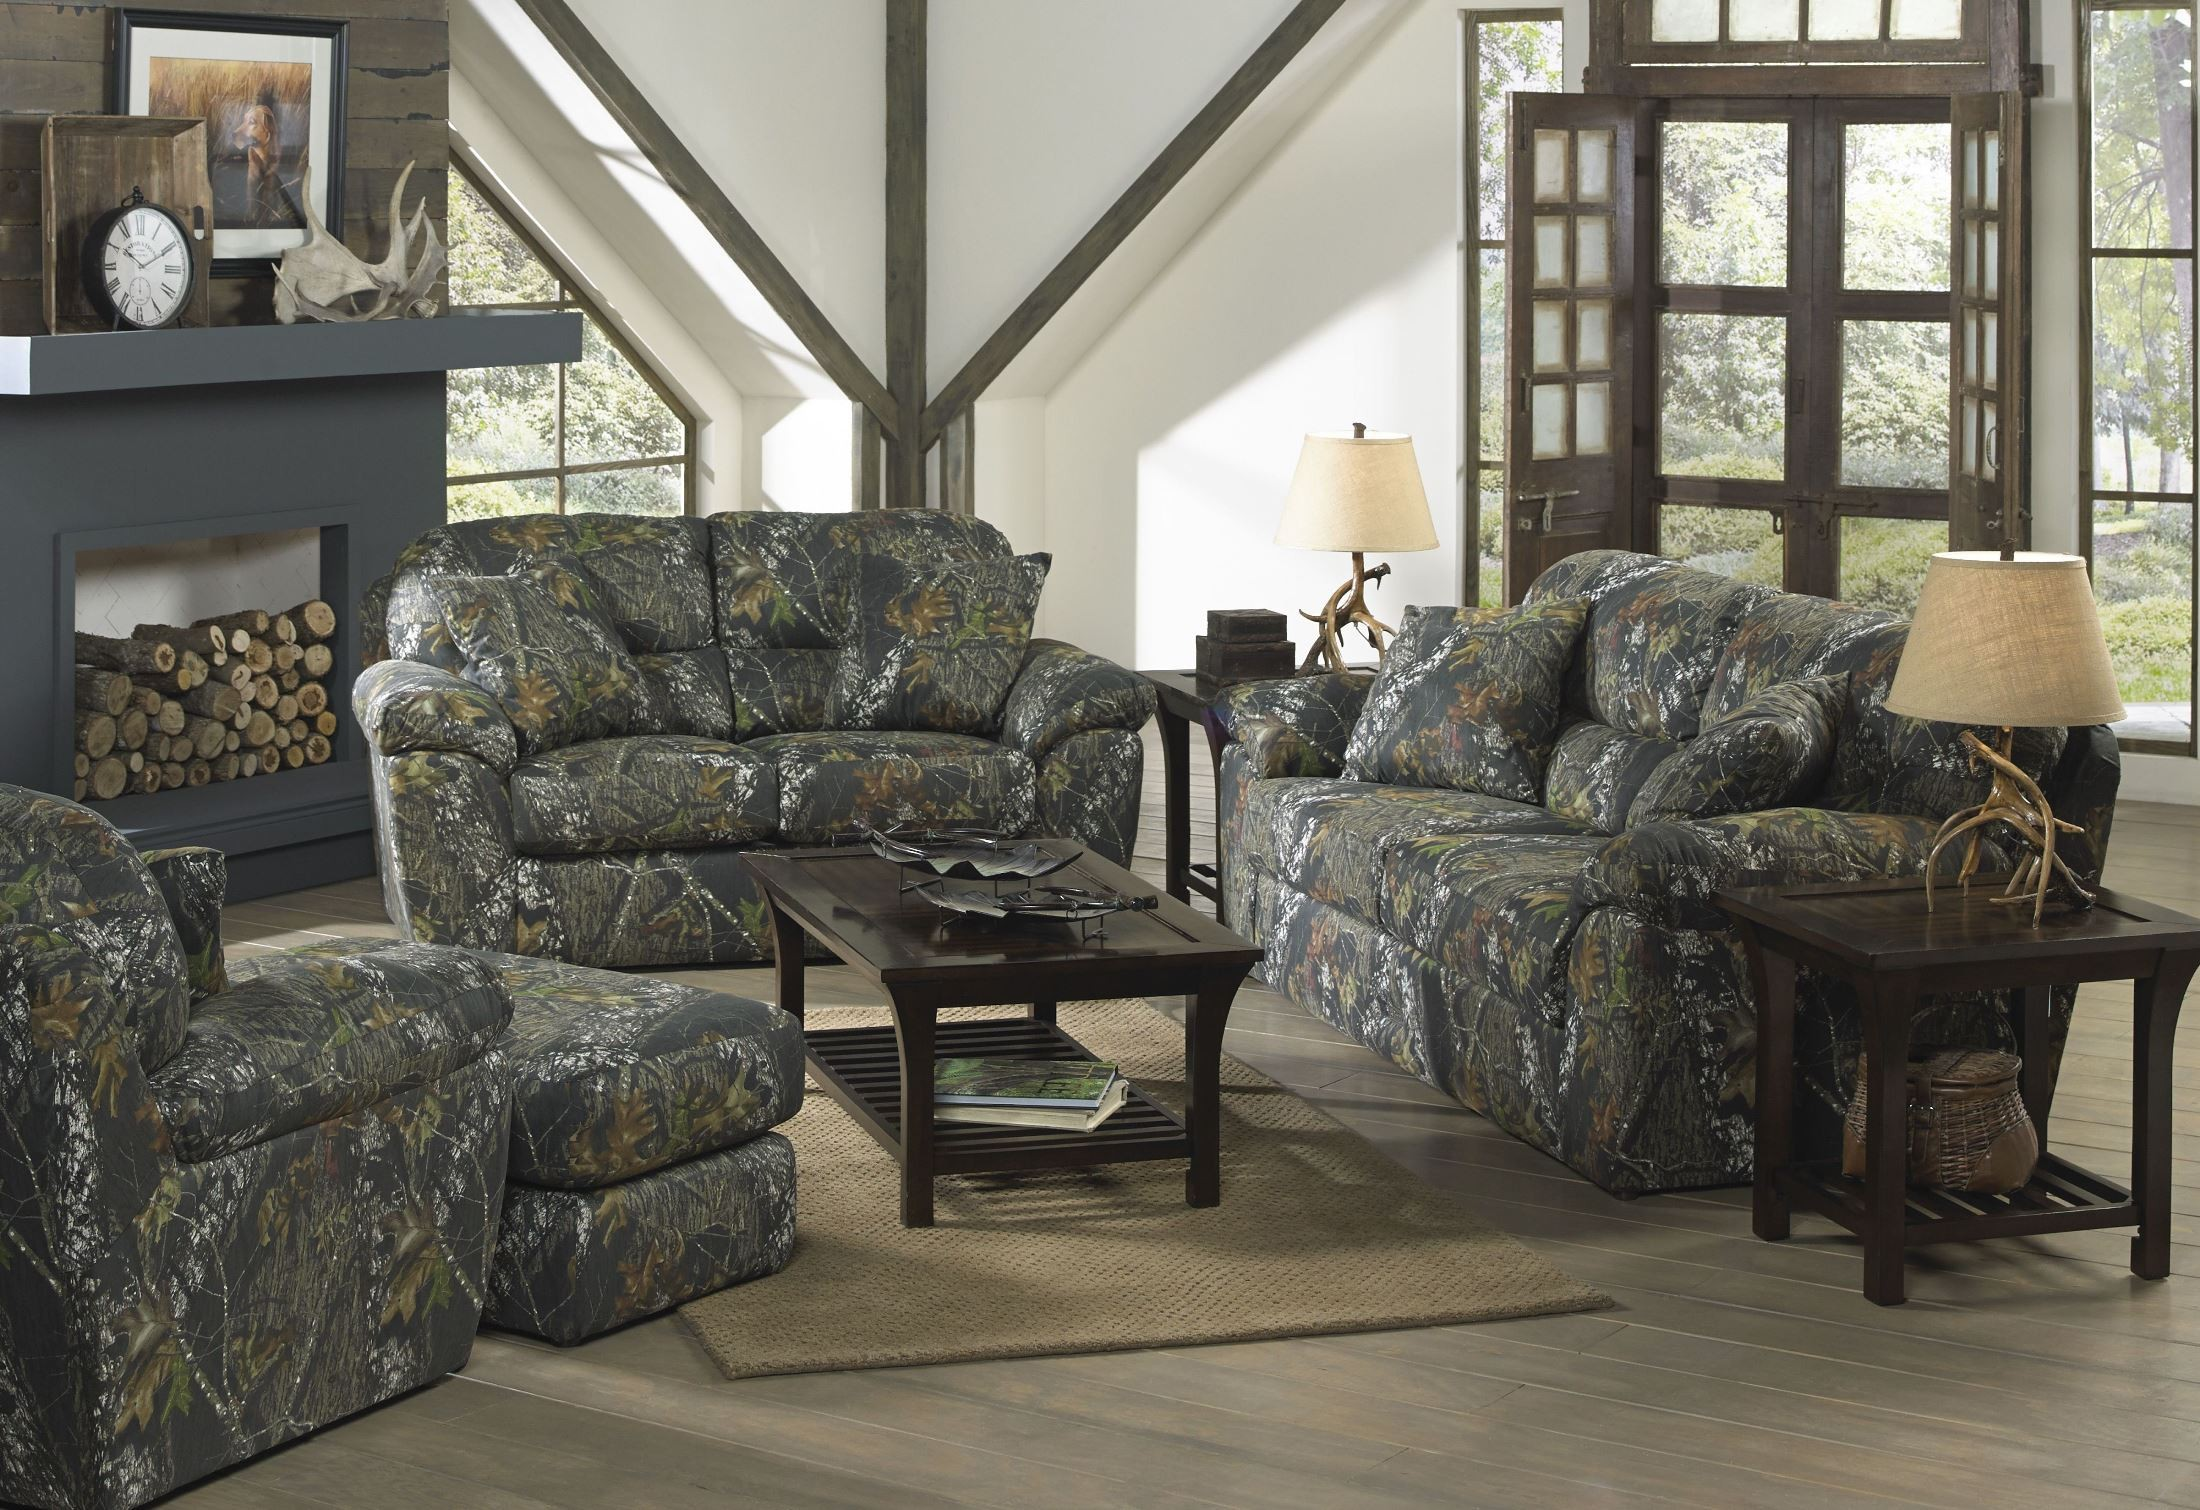 Cumberland Mossy Oak New Breakup Living Room Set 3218 03 2657 15 Duck Dynasty